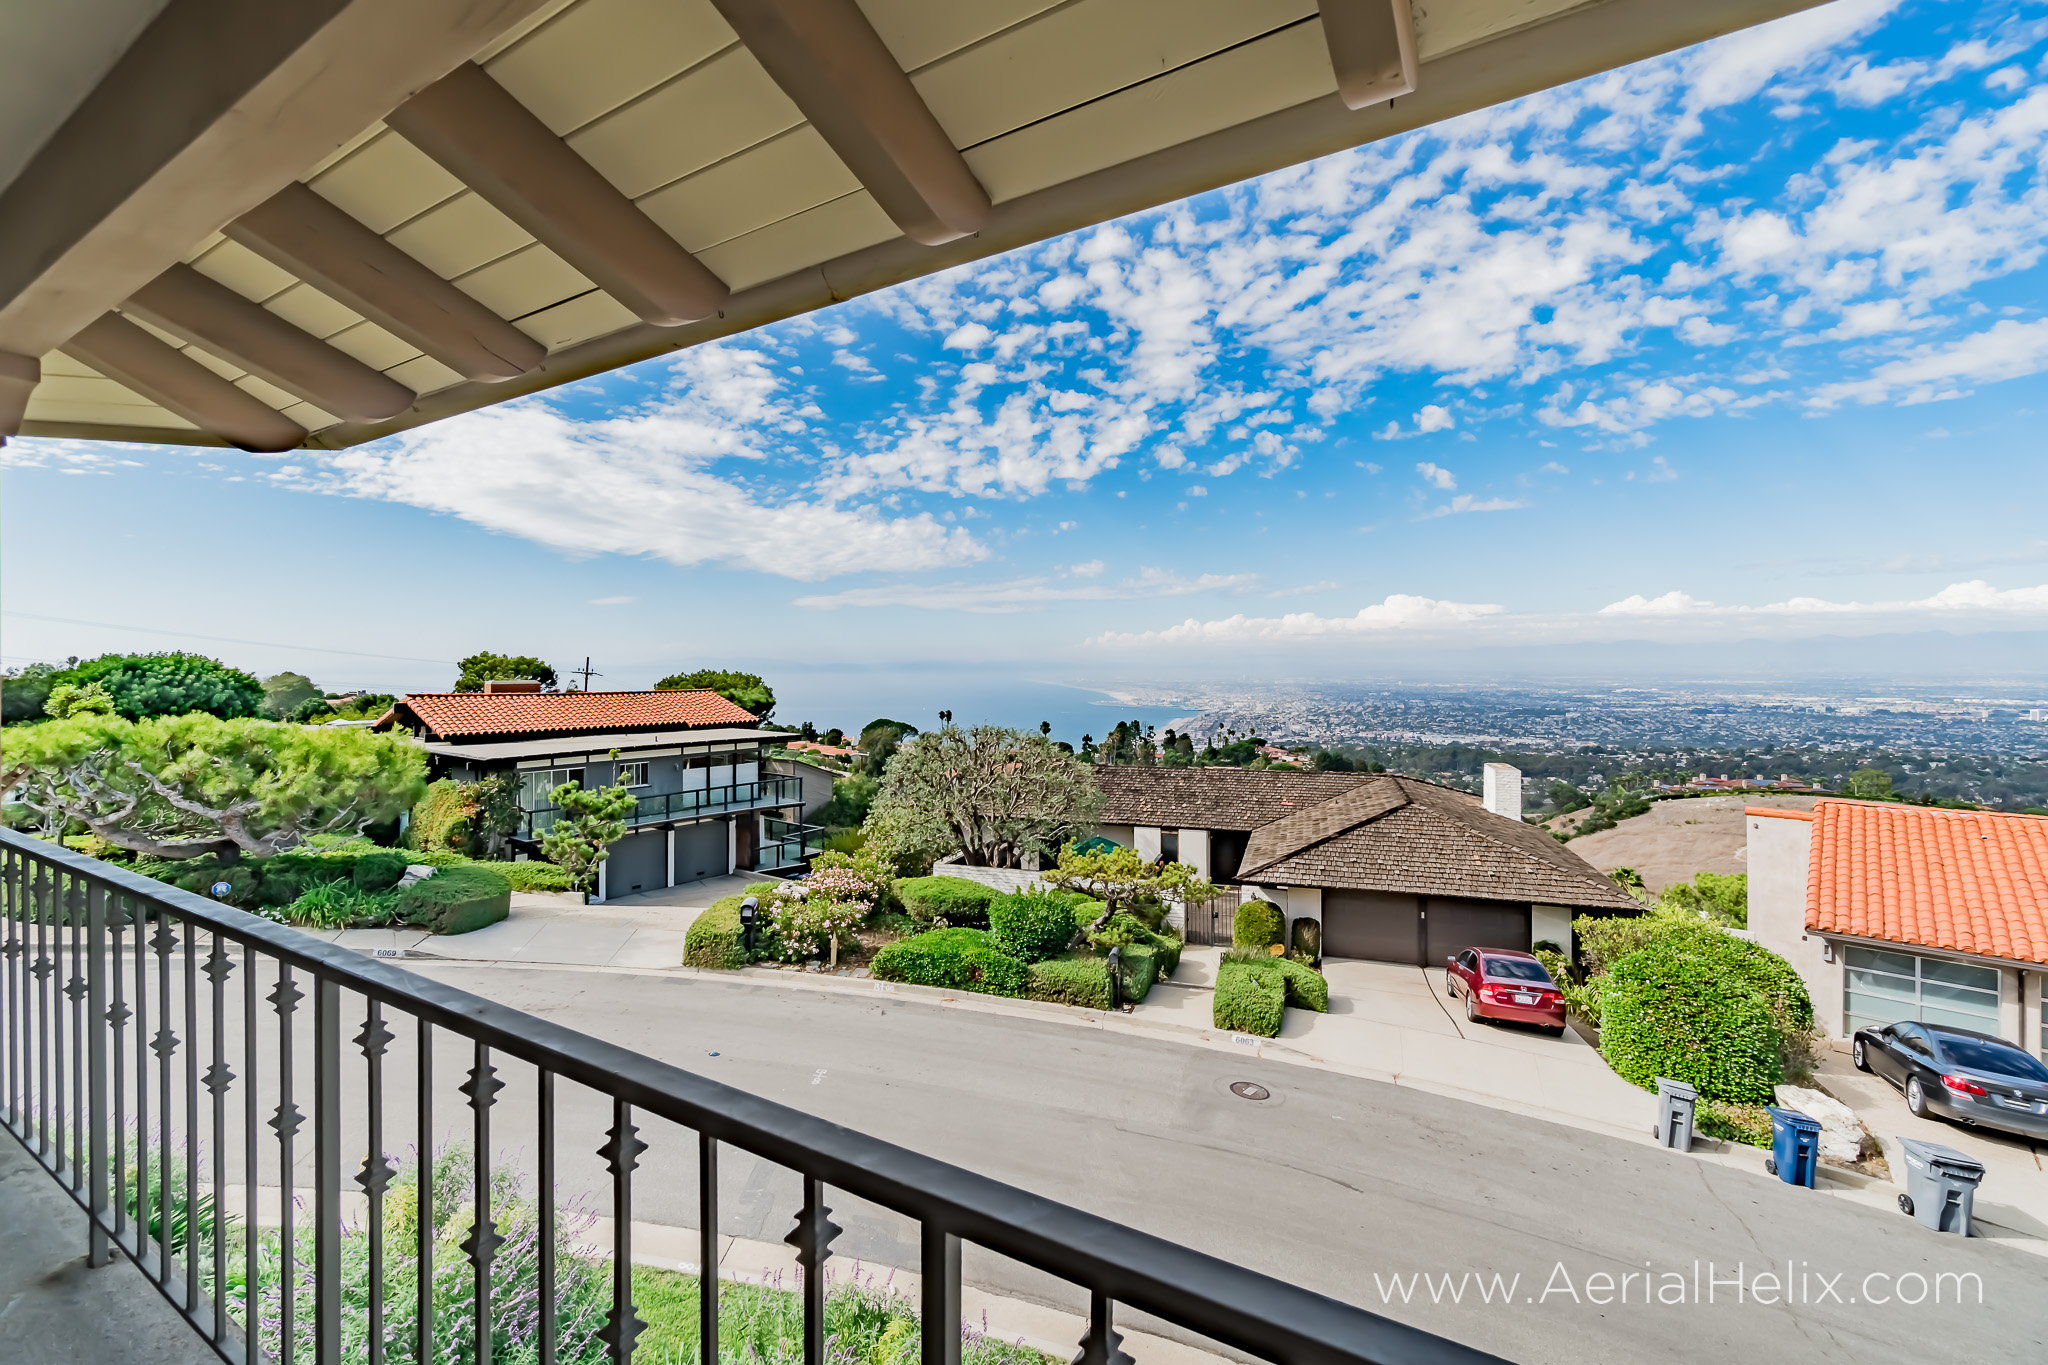 Woodfern Drive Ground- HELIX Real Estate Aerial Photographer-11.jpg